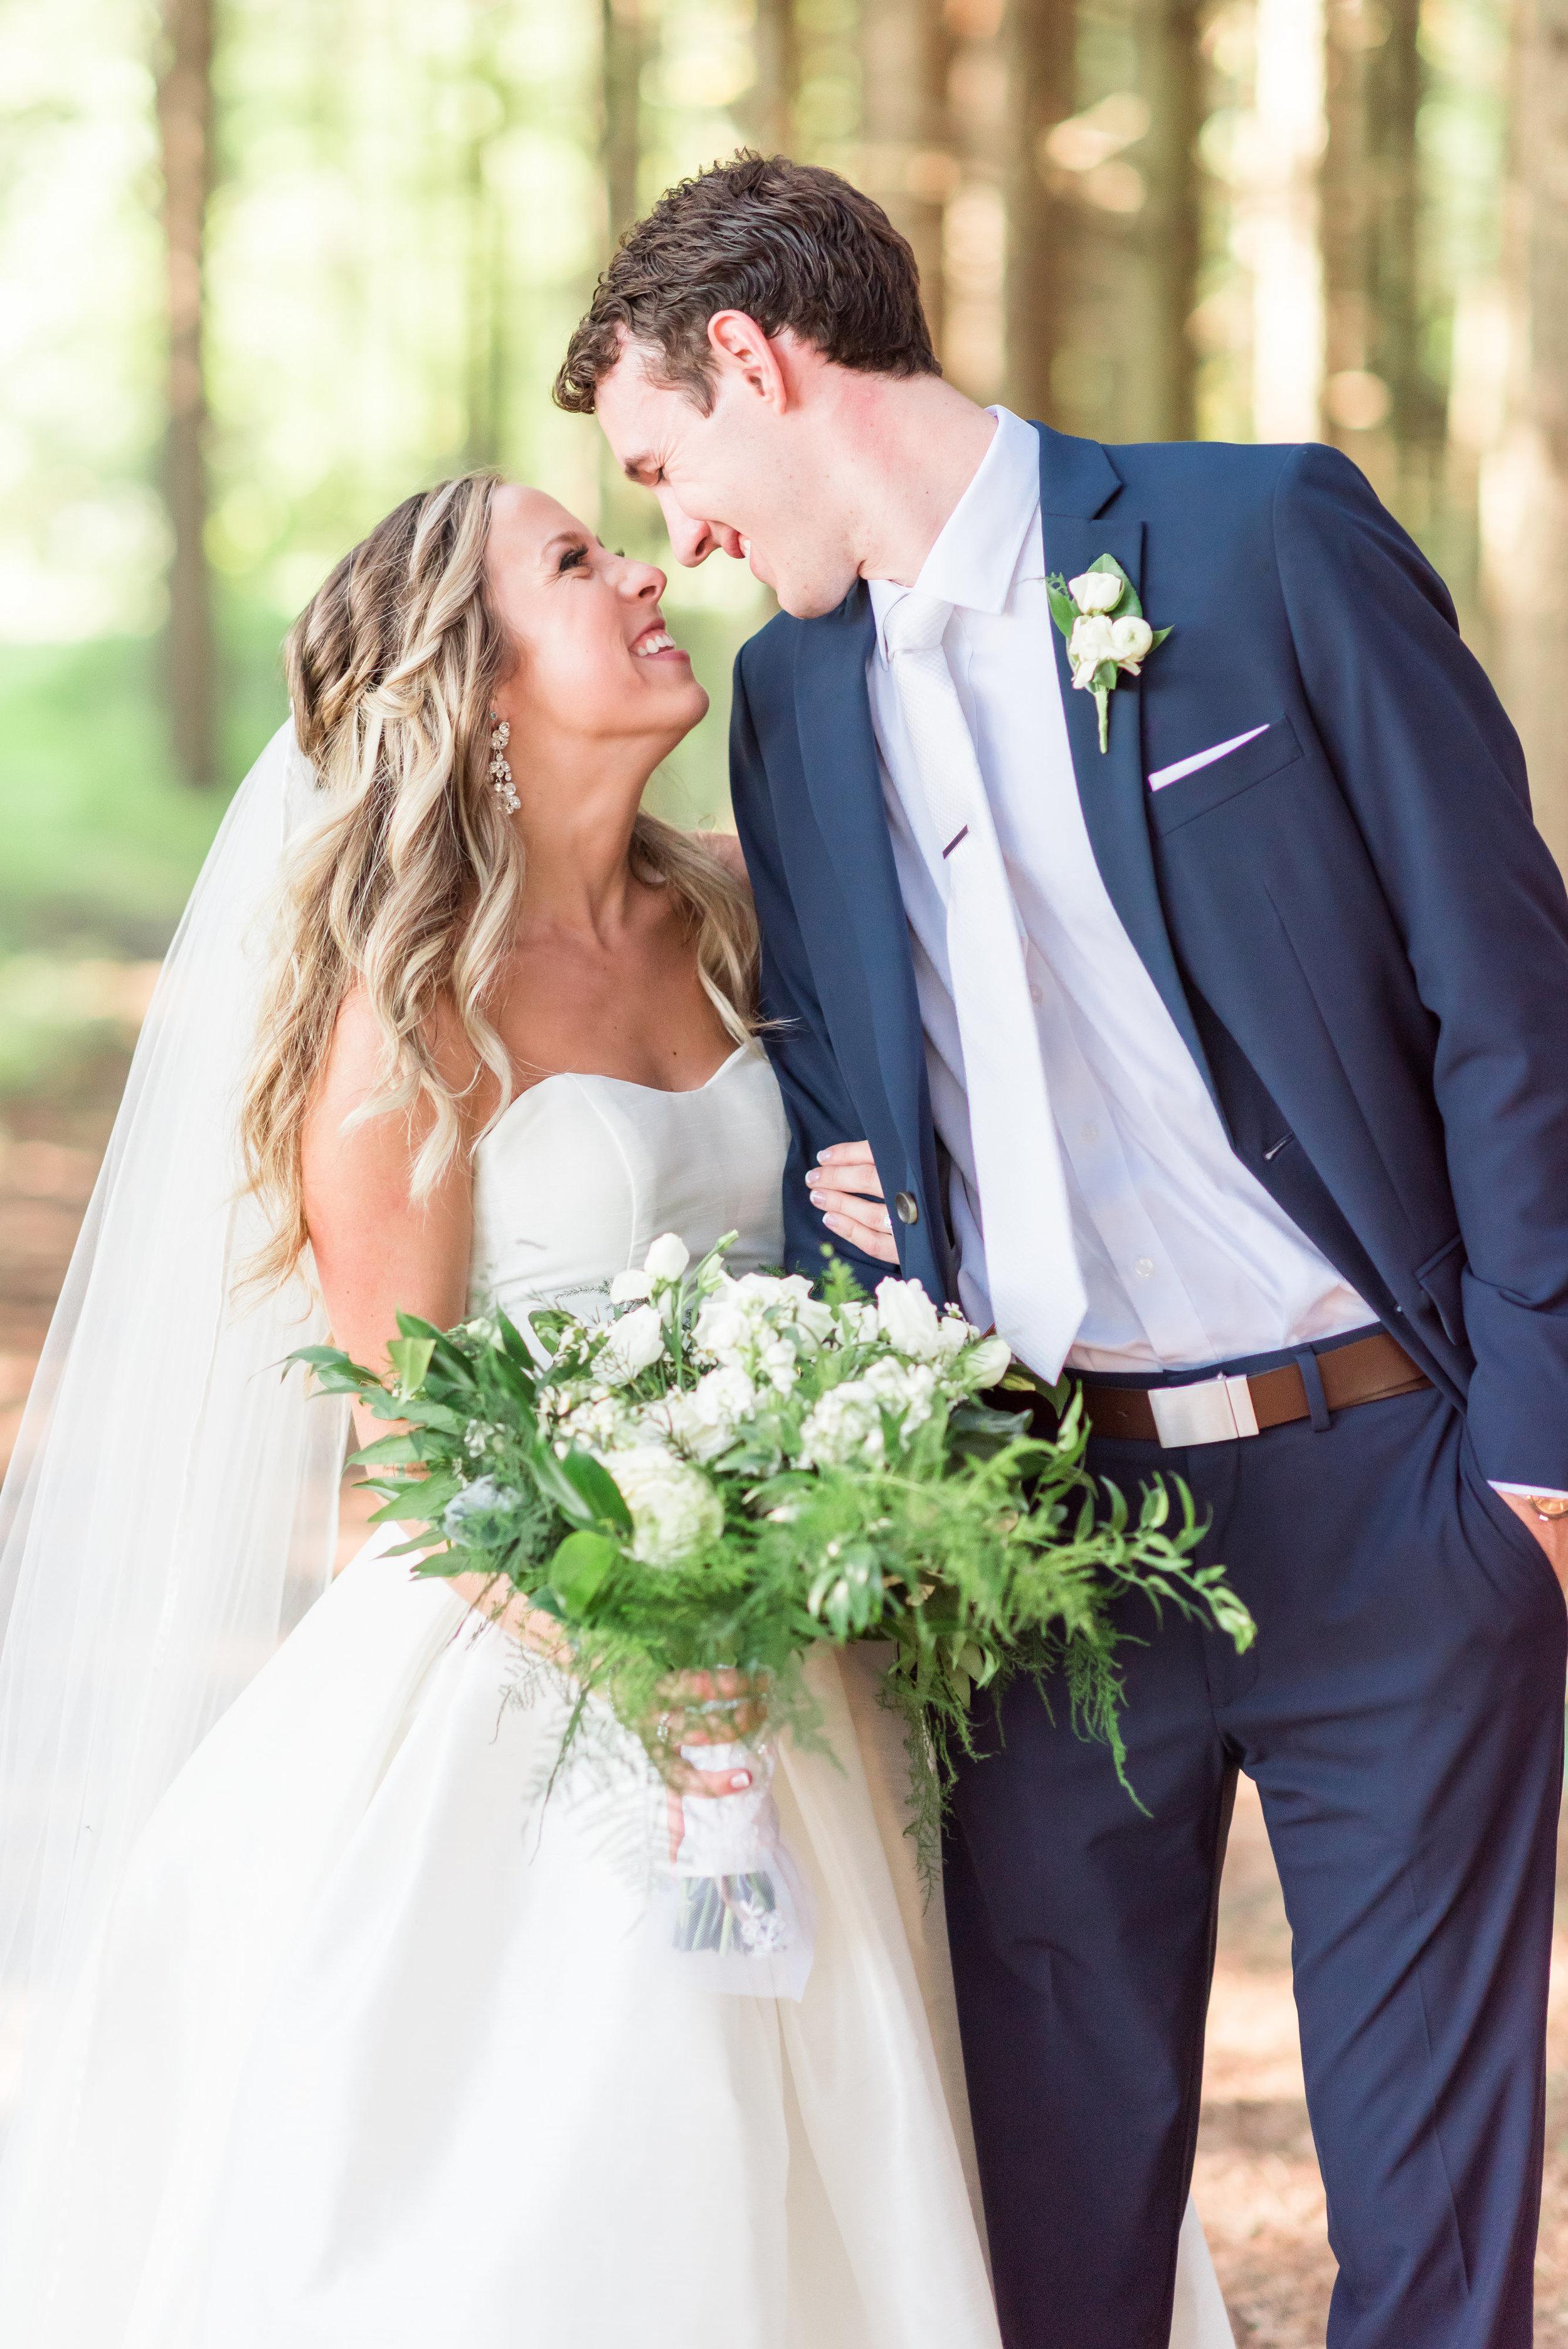 The Dugenske Wedding 9 15 18-0723.jpg